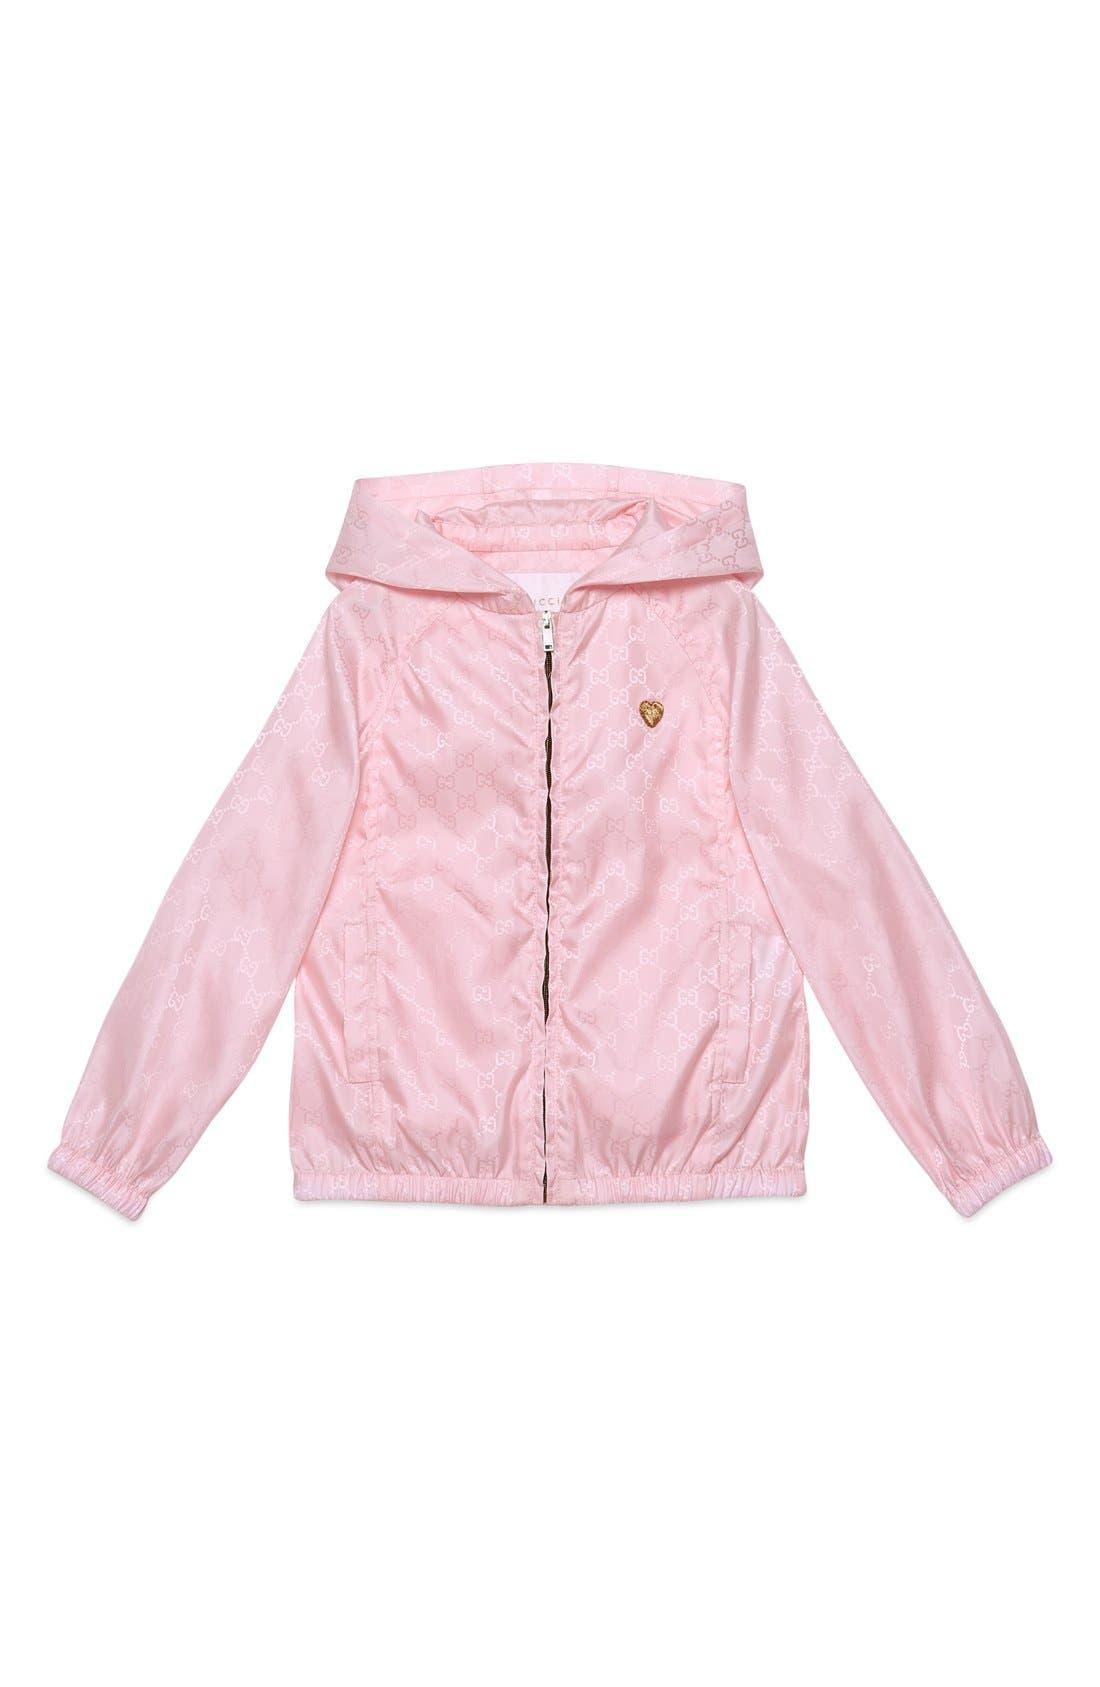 Main Image - Gucci Logo Jacquard Nylon Jacket (Little Girls & Big Girls)